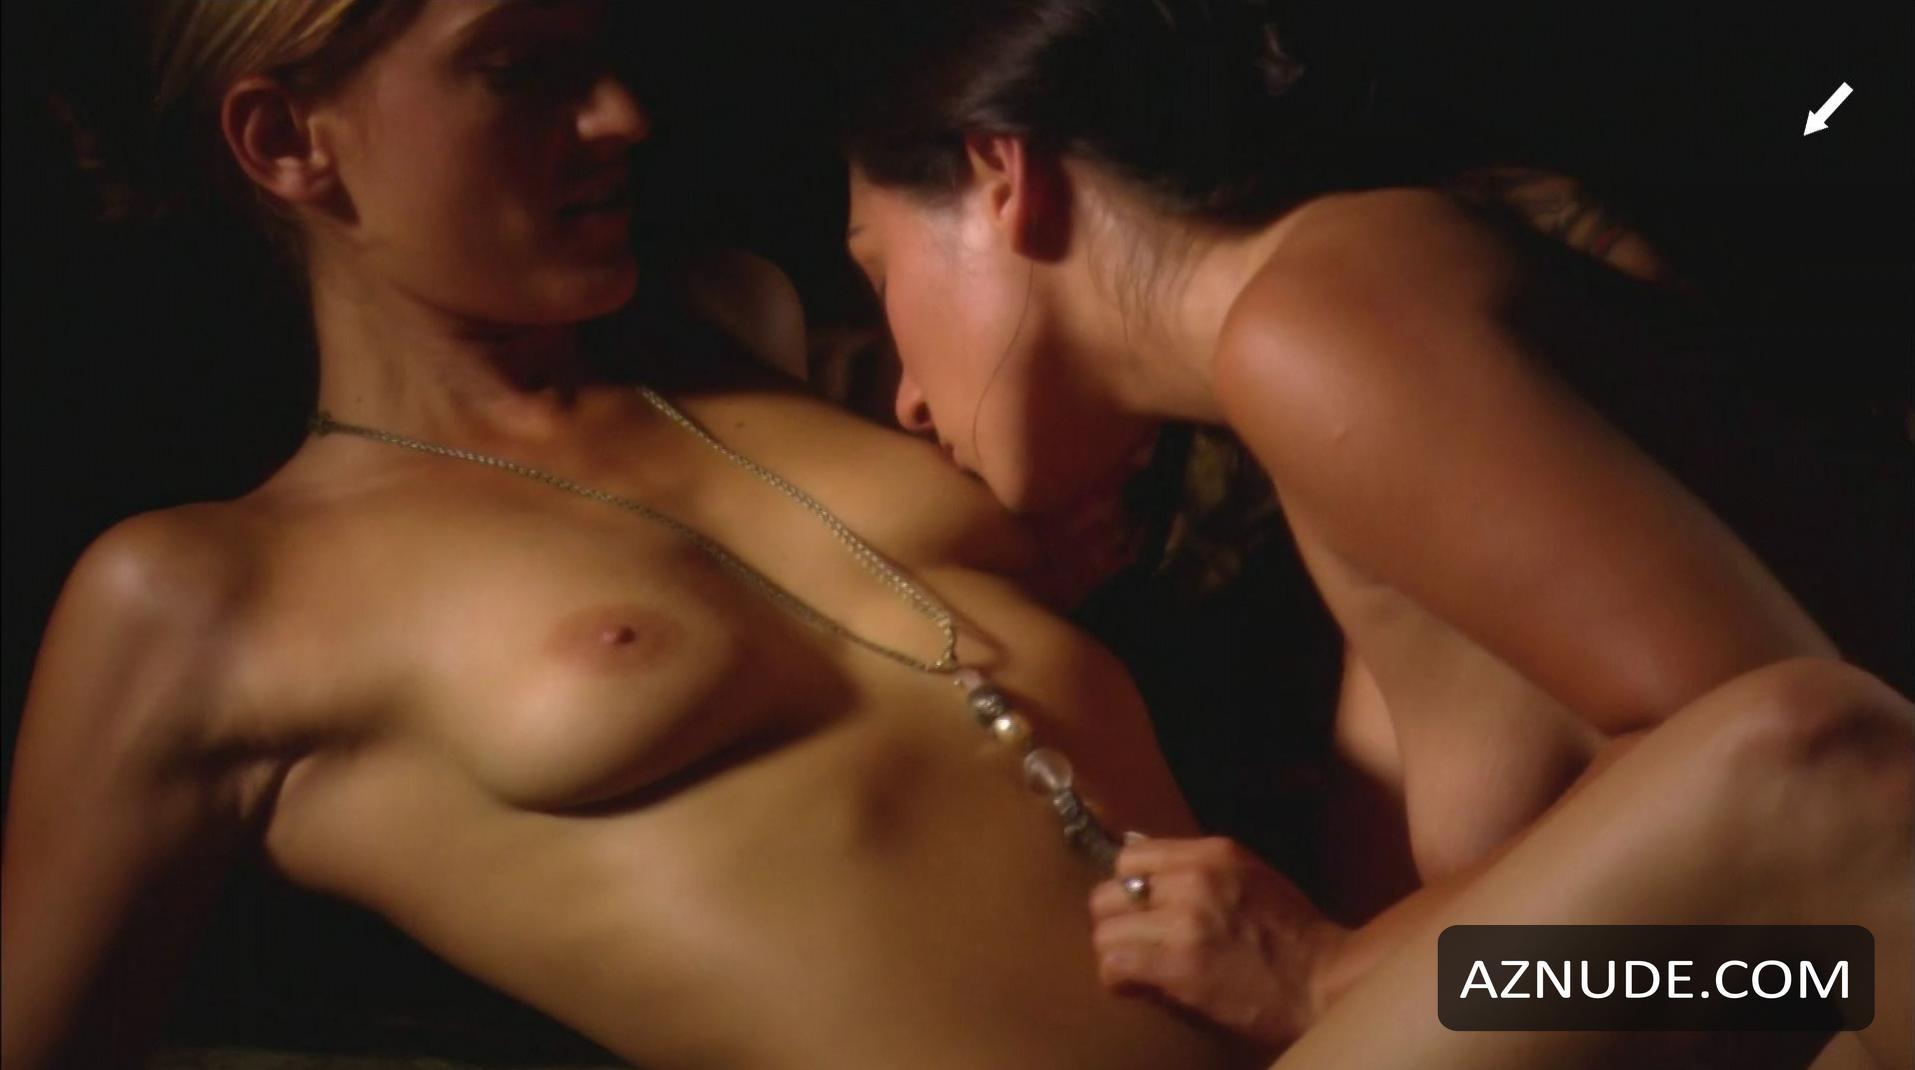 erotic traveller